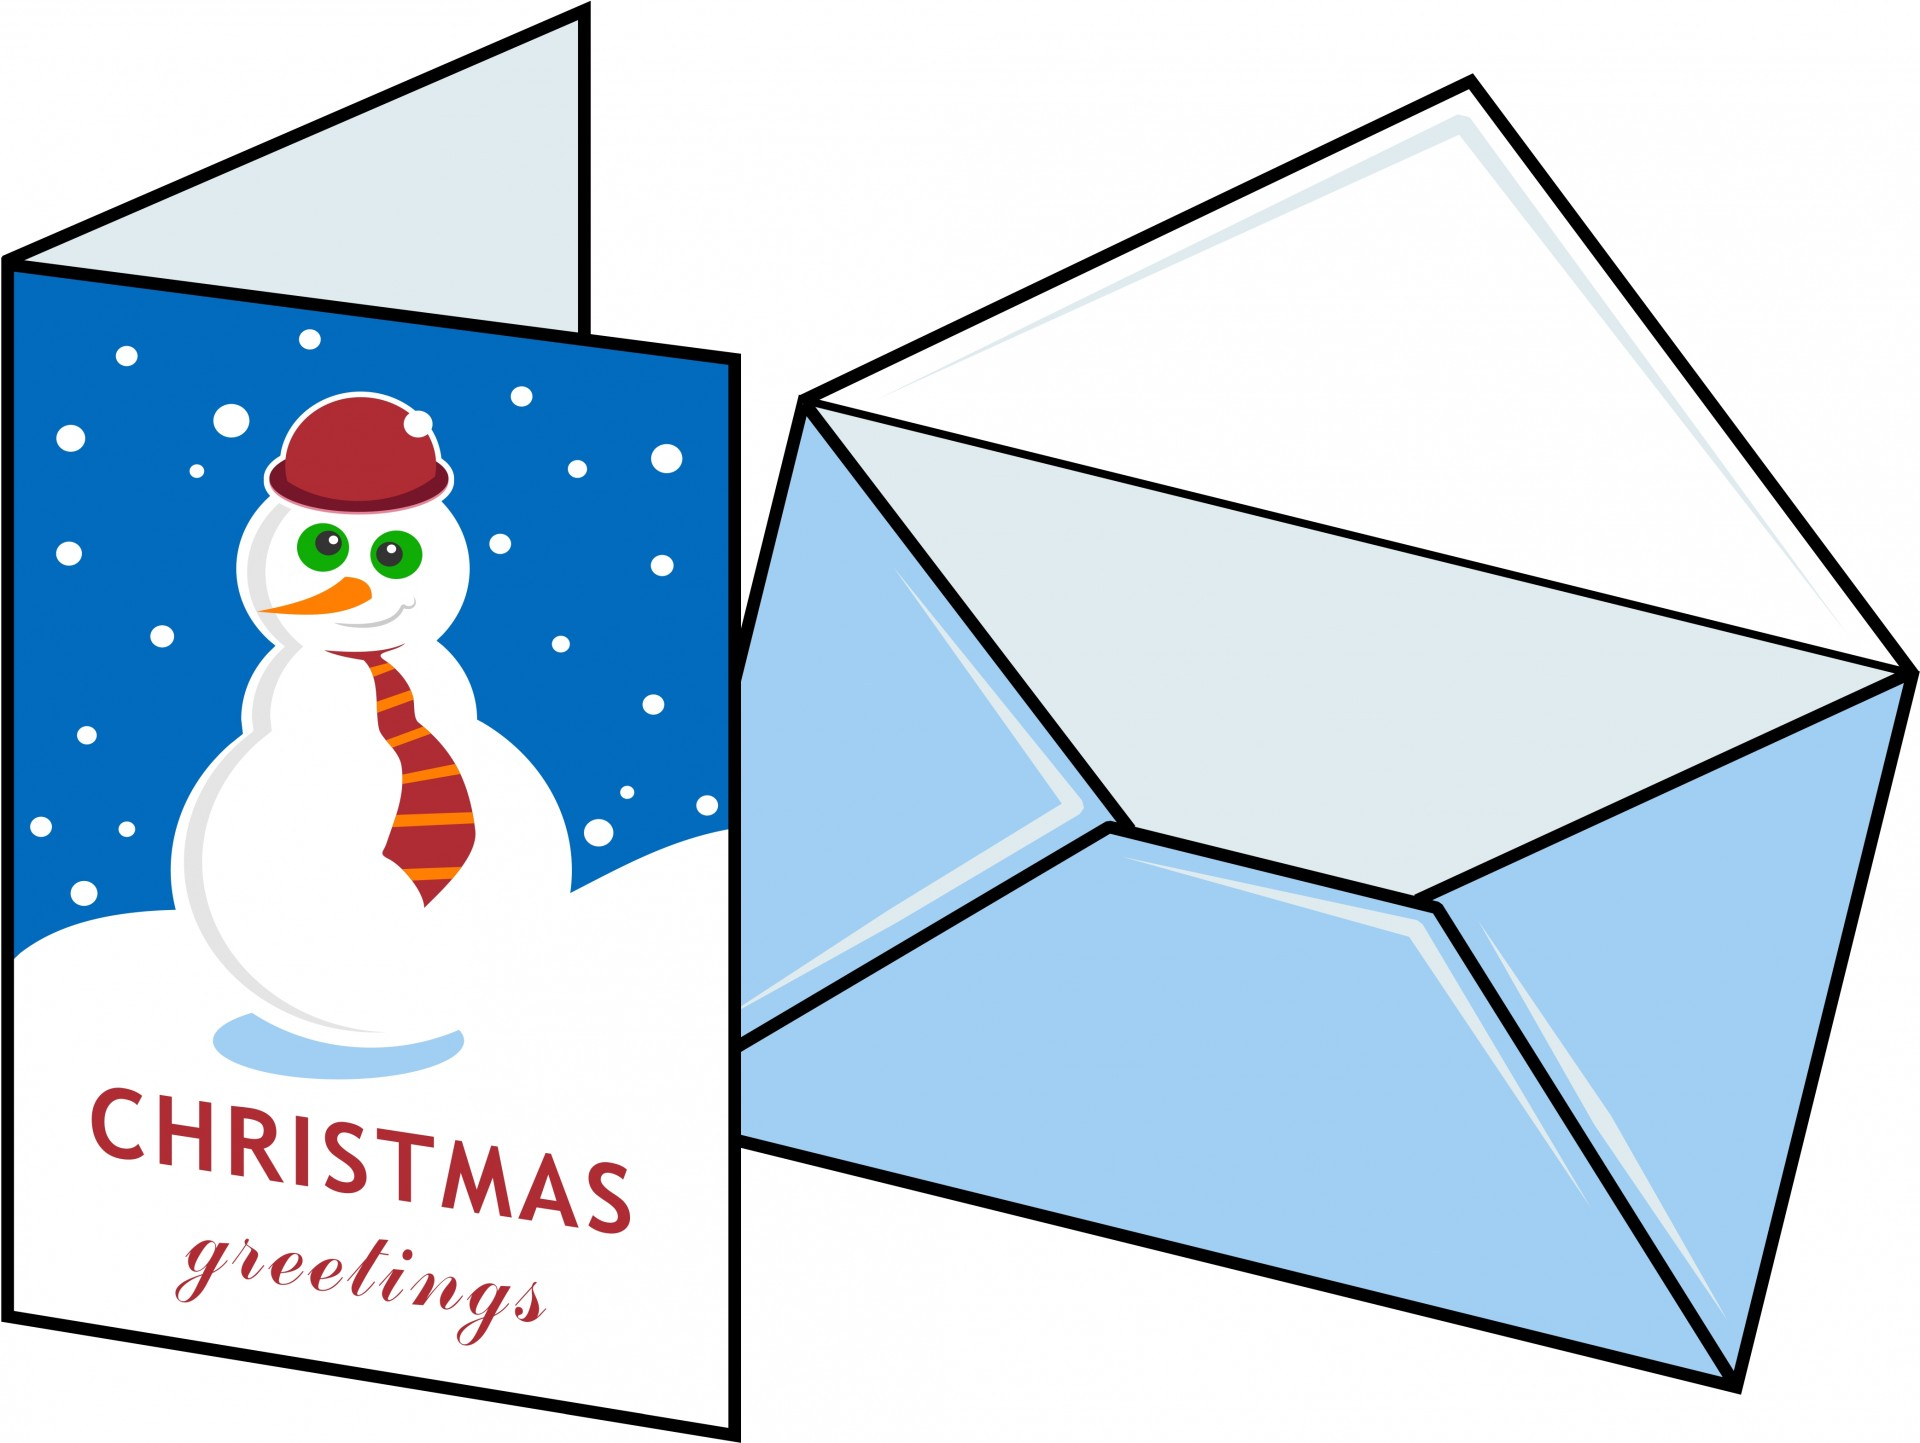 Christmas Card Design Free Stock Photo.